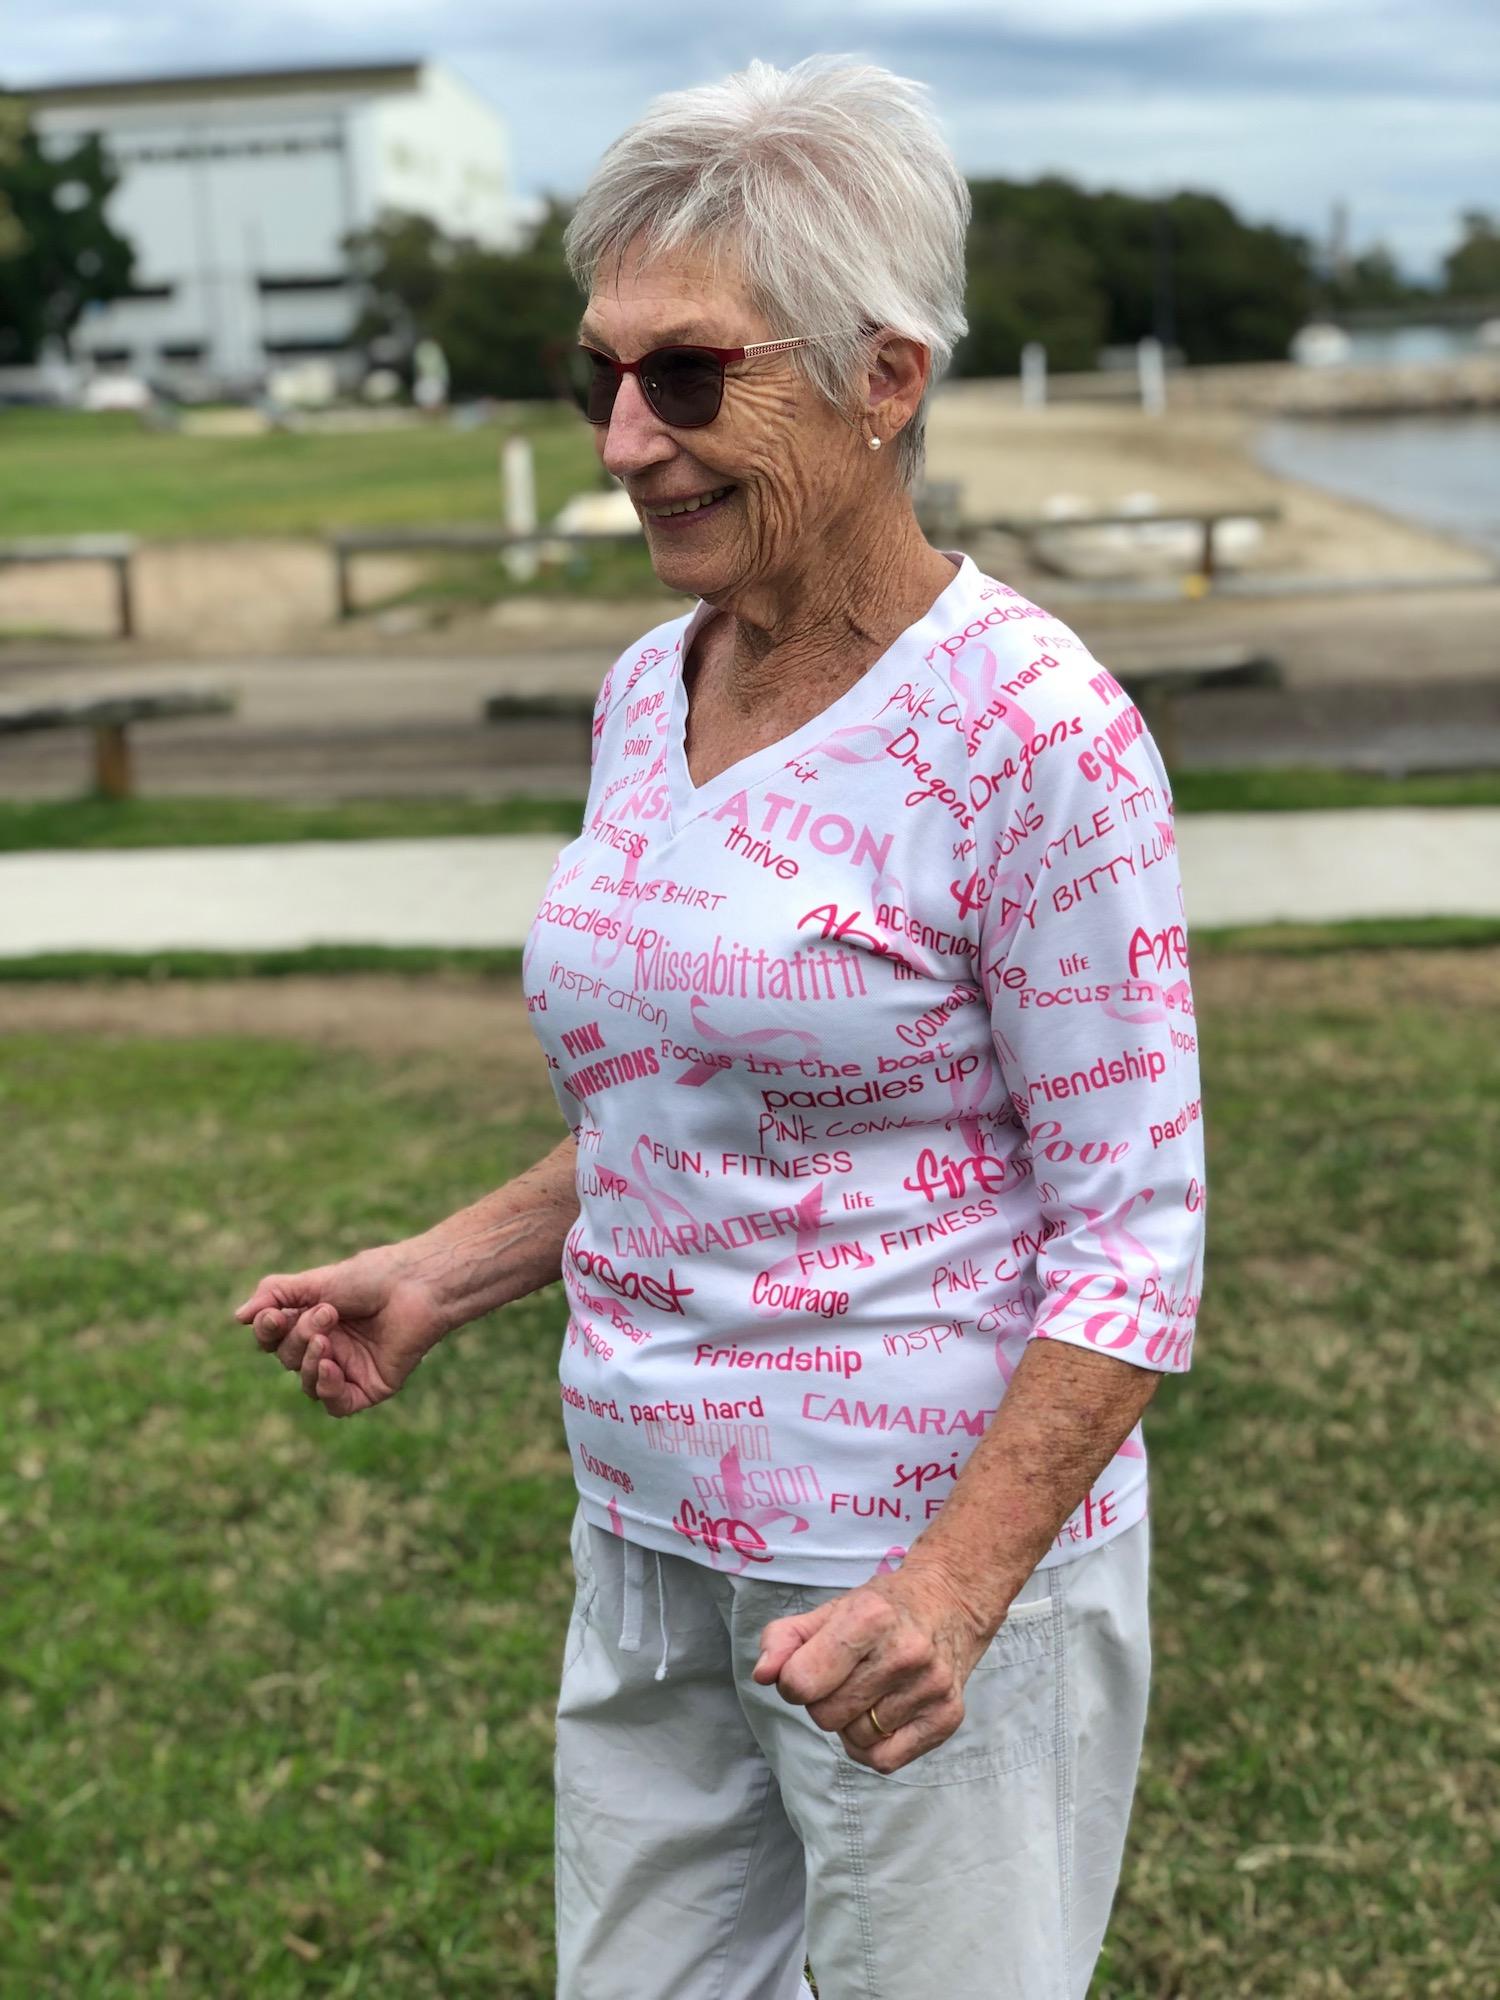 ewen-shirt-team-missabittatitti-breast-cancer-recovery-support-brisbane